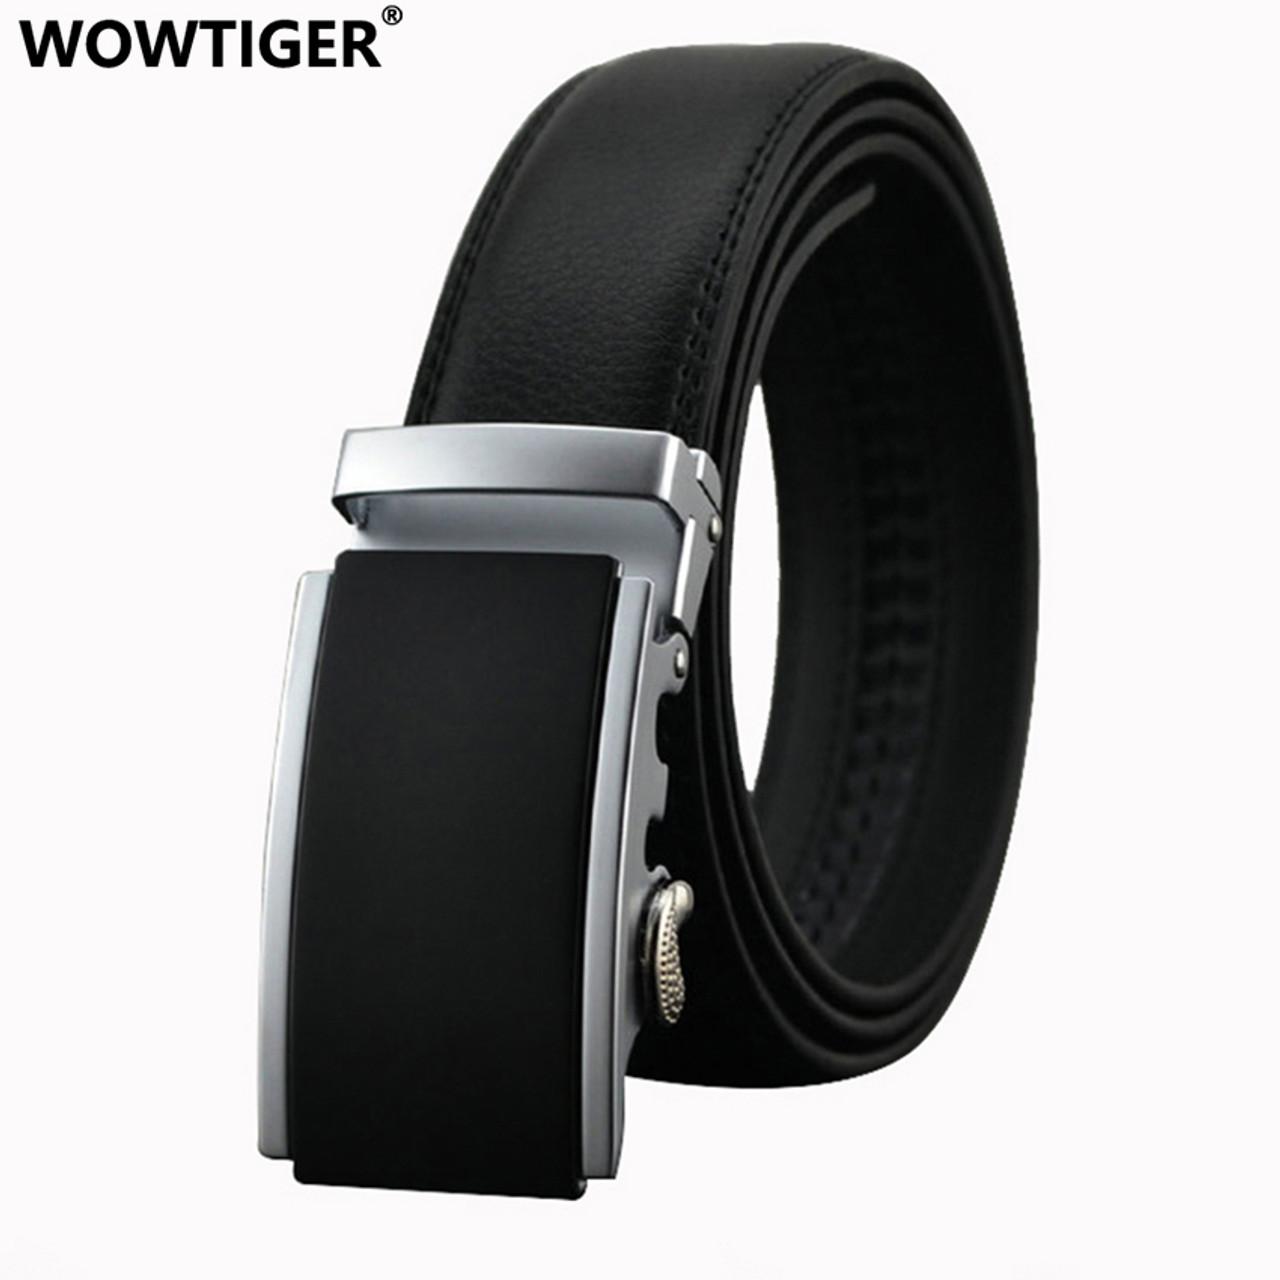 26a2f355fae WOWTIGER Belt New Male Designer Automatic Buckle Cowhide Leather men belt  110cm-130cm Luxury belts ...